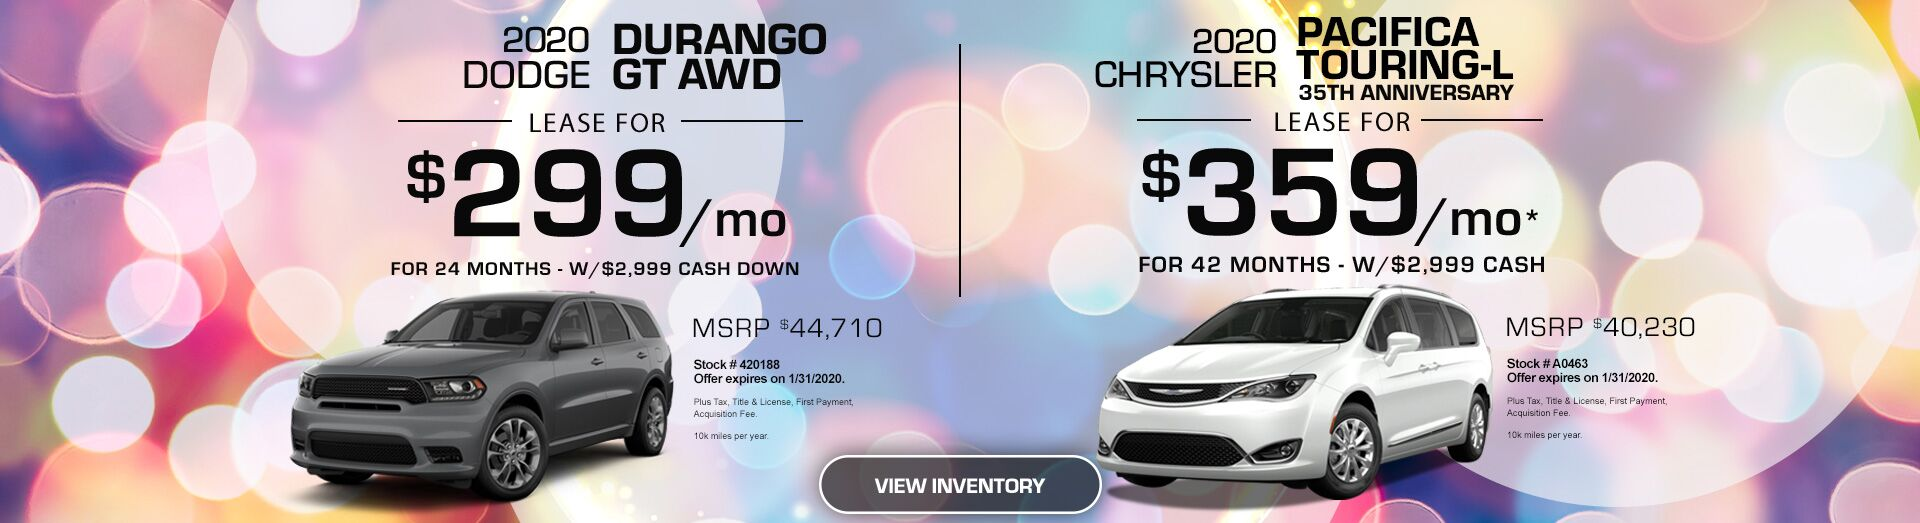 Chrysler Dealership Mn >> Car Dealership Fury Chrysler Dodge Jeep Ram St Paul Mn